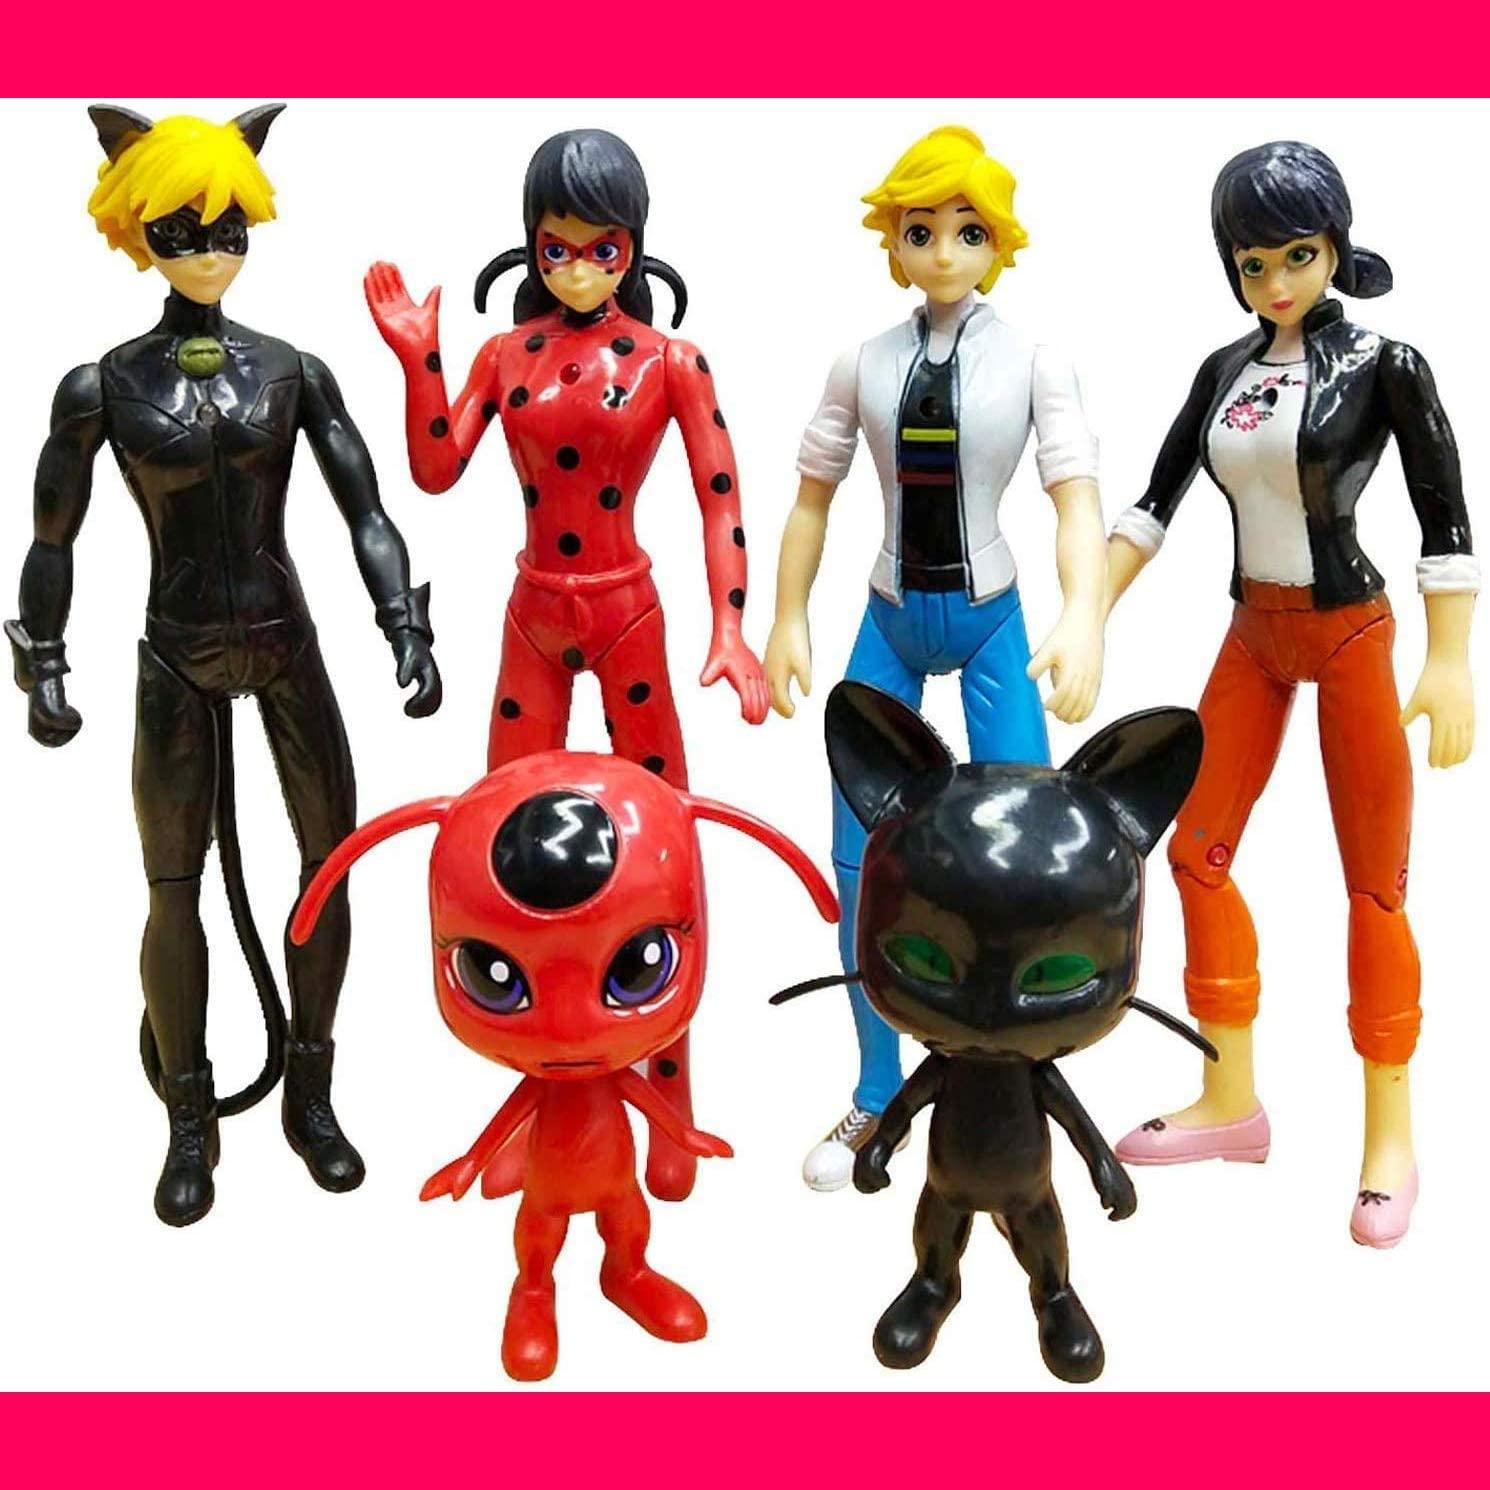 PANASIGN Ladybug Action Figures toy 10 Pcs Tales of Ladybug & Cat Noir 2.76